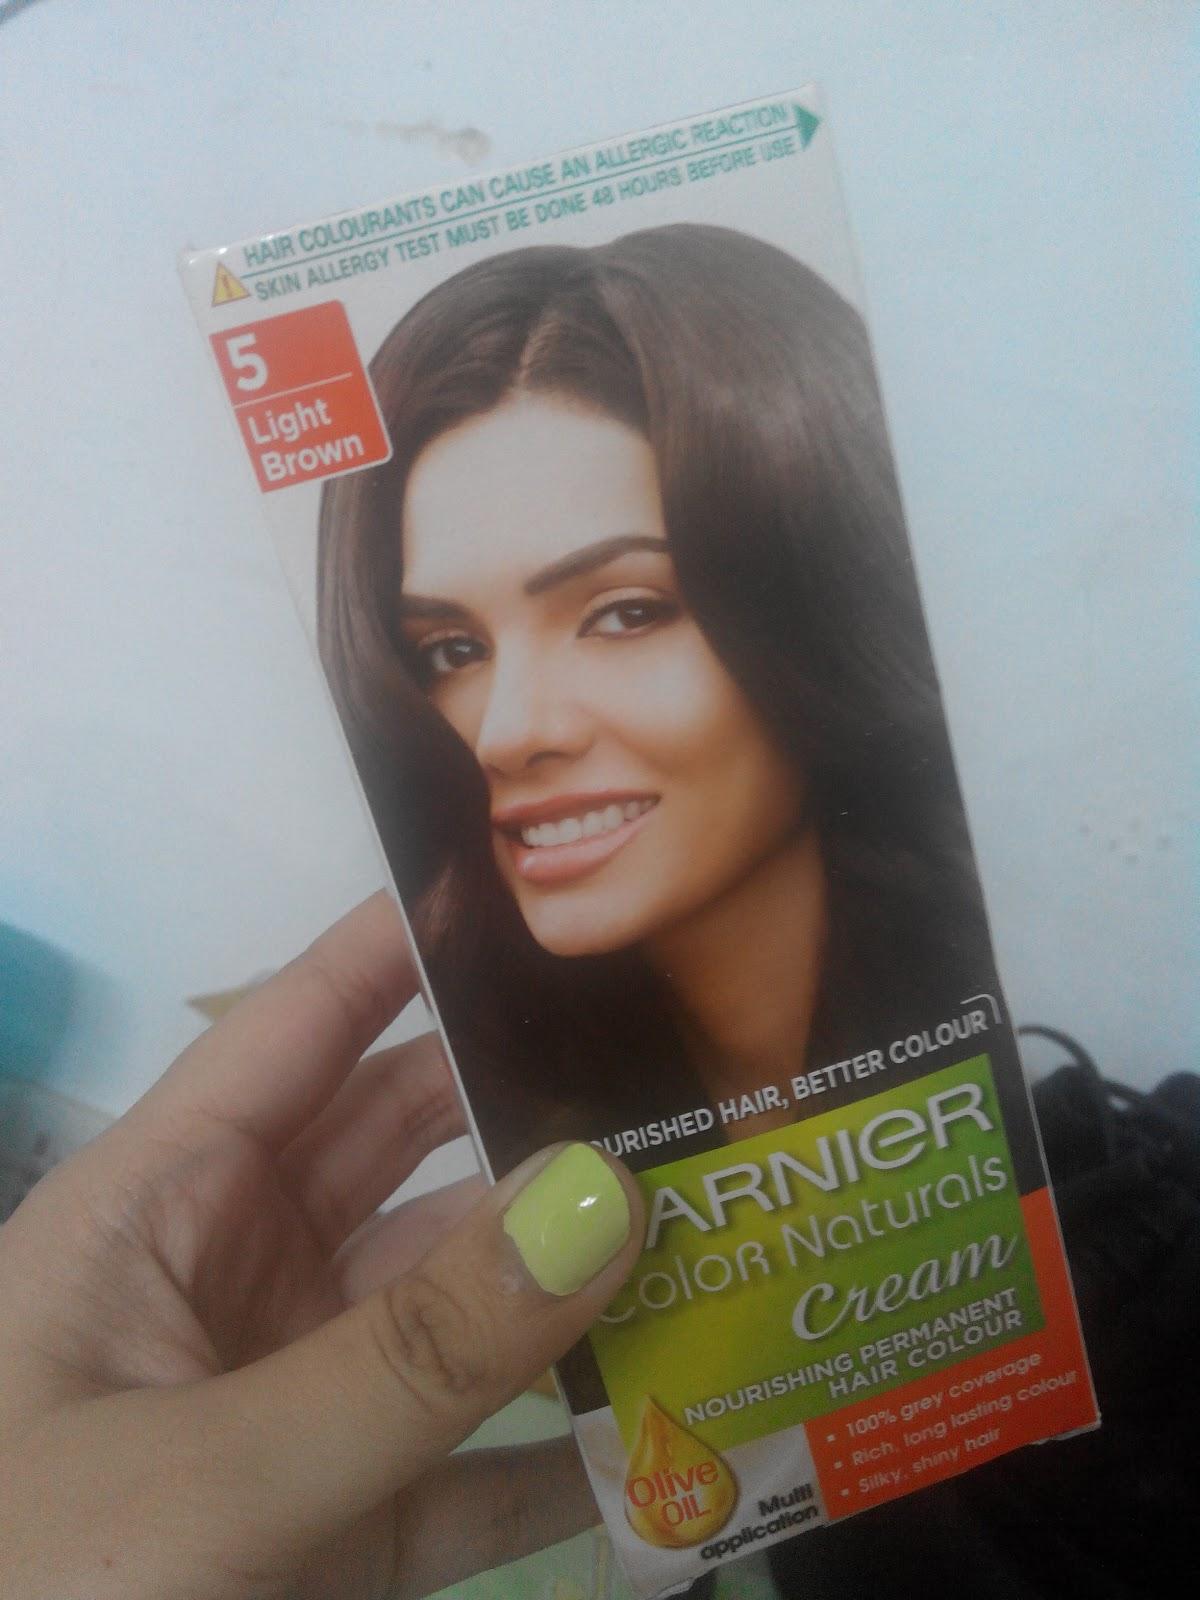 8667022c3d7   REVIEW   Garnier Color Natural Cream  5